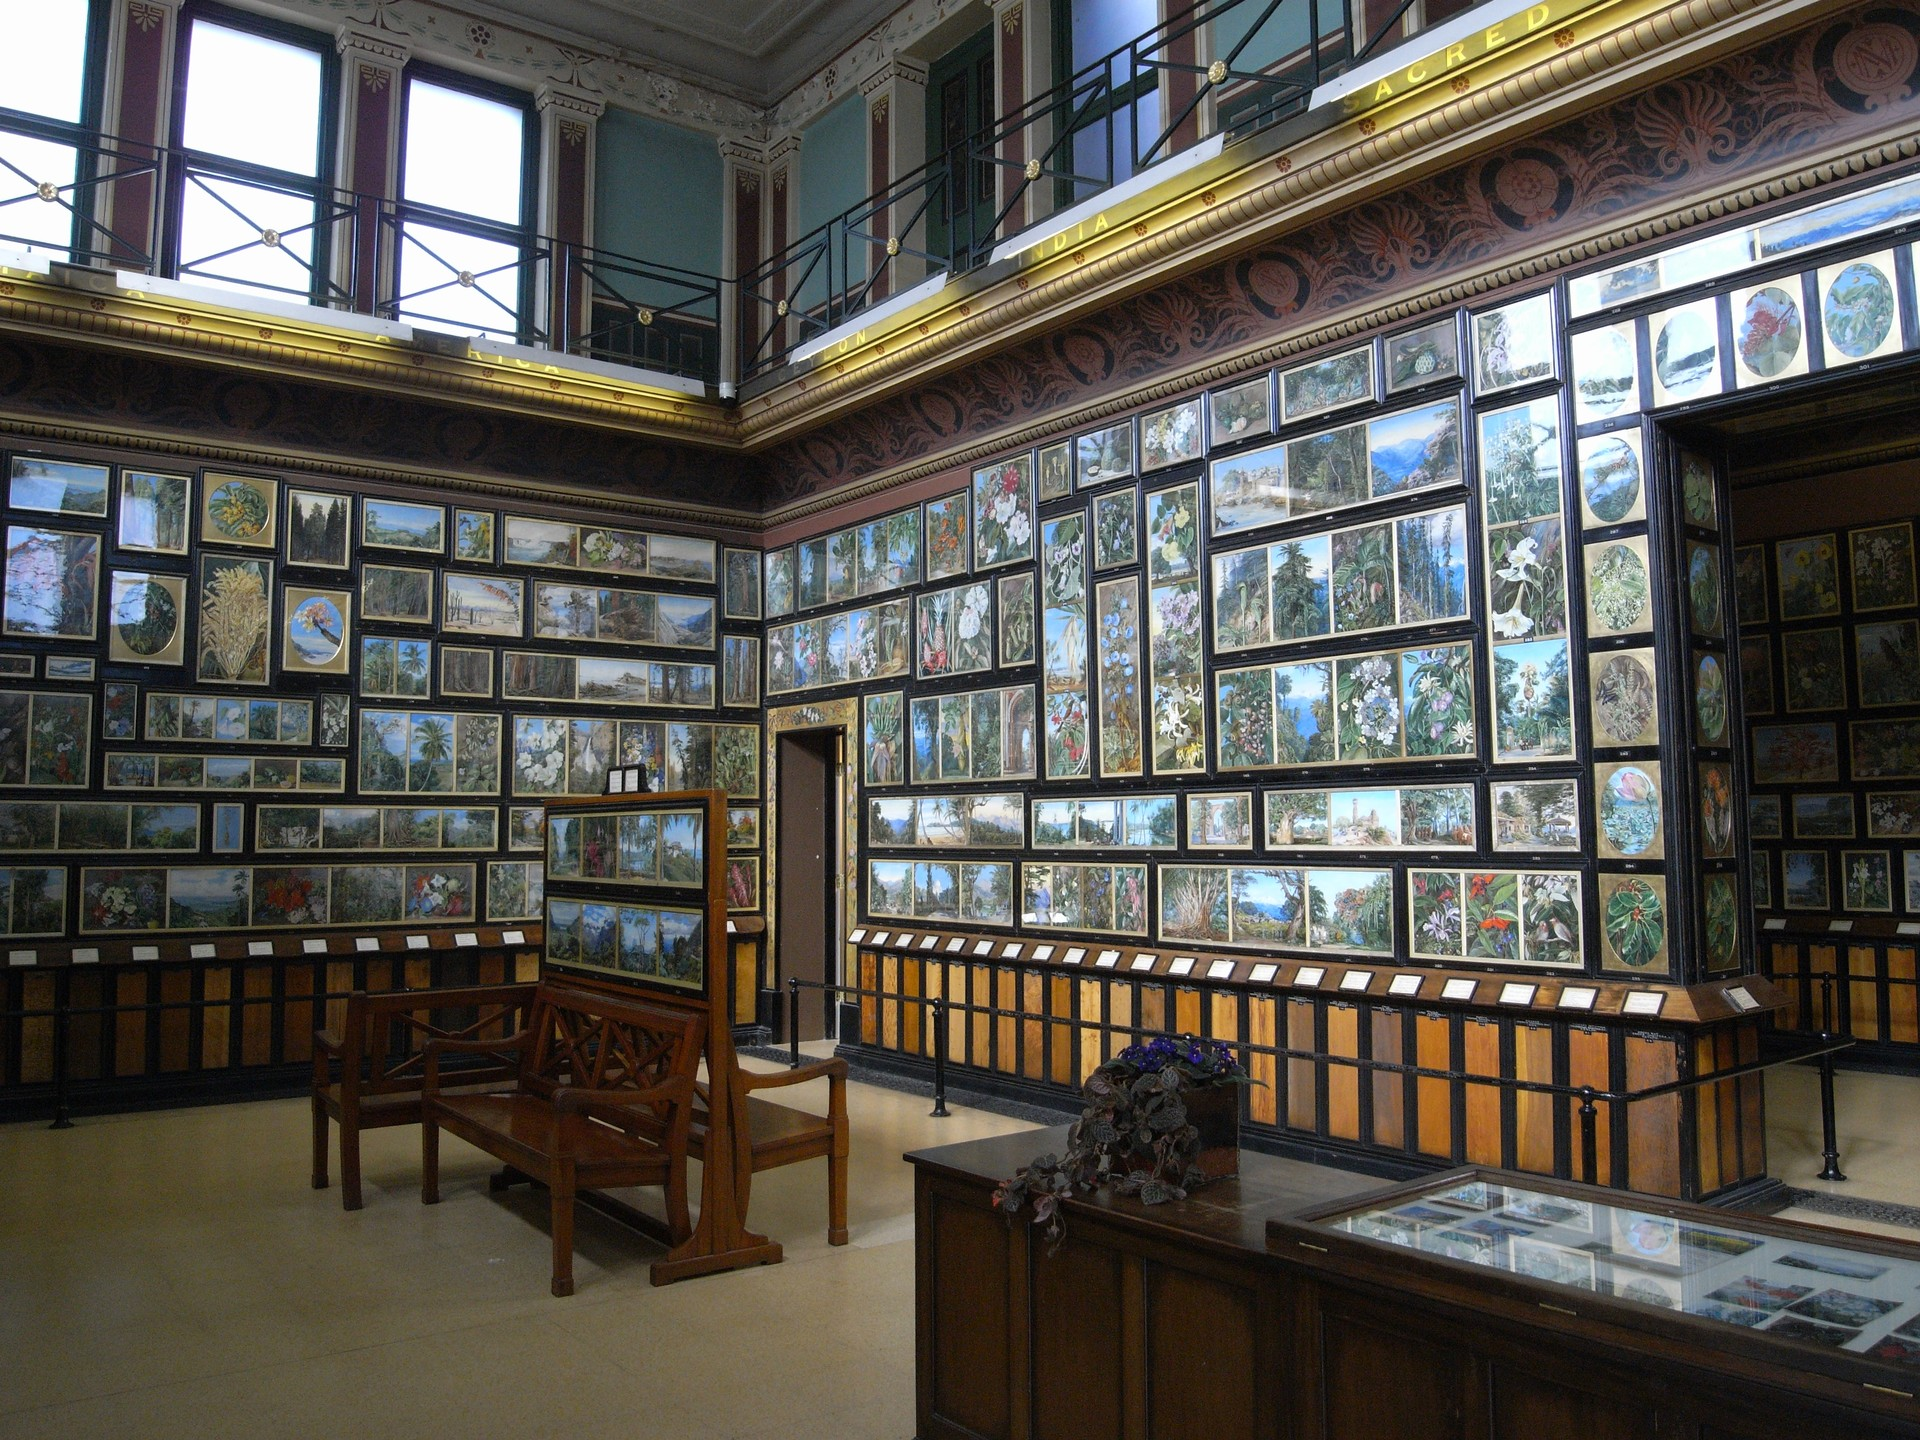 The Marianne North Gallery interior, Kew Gardens